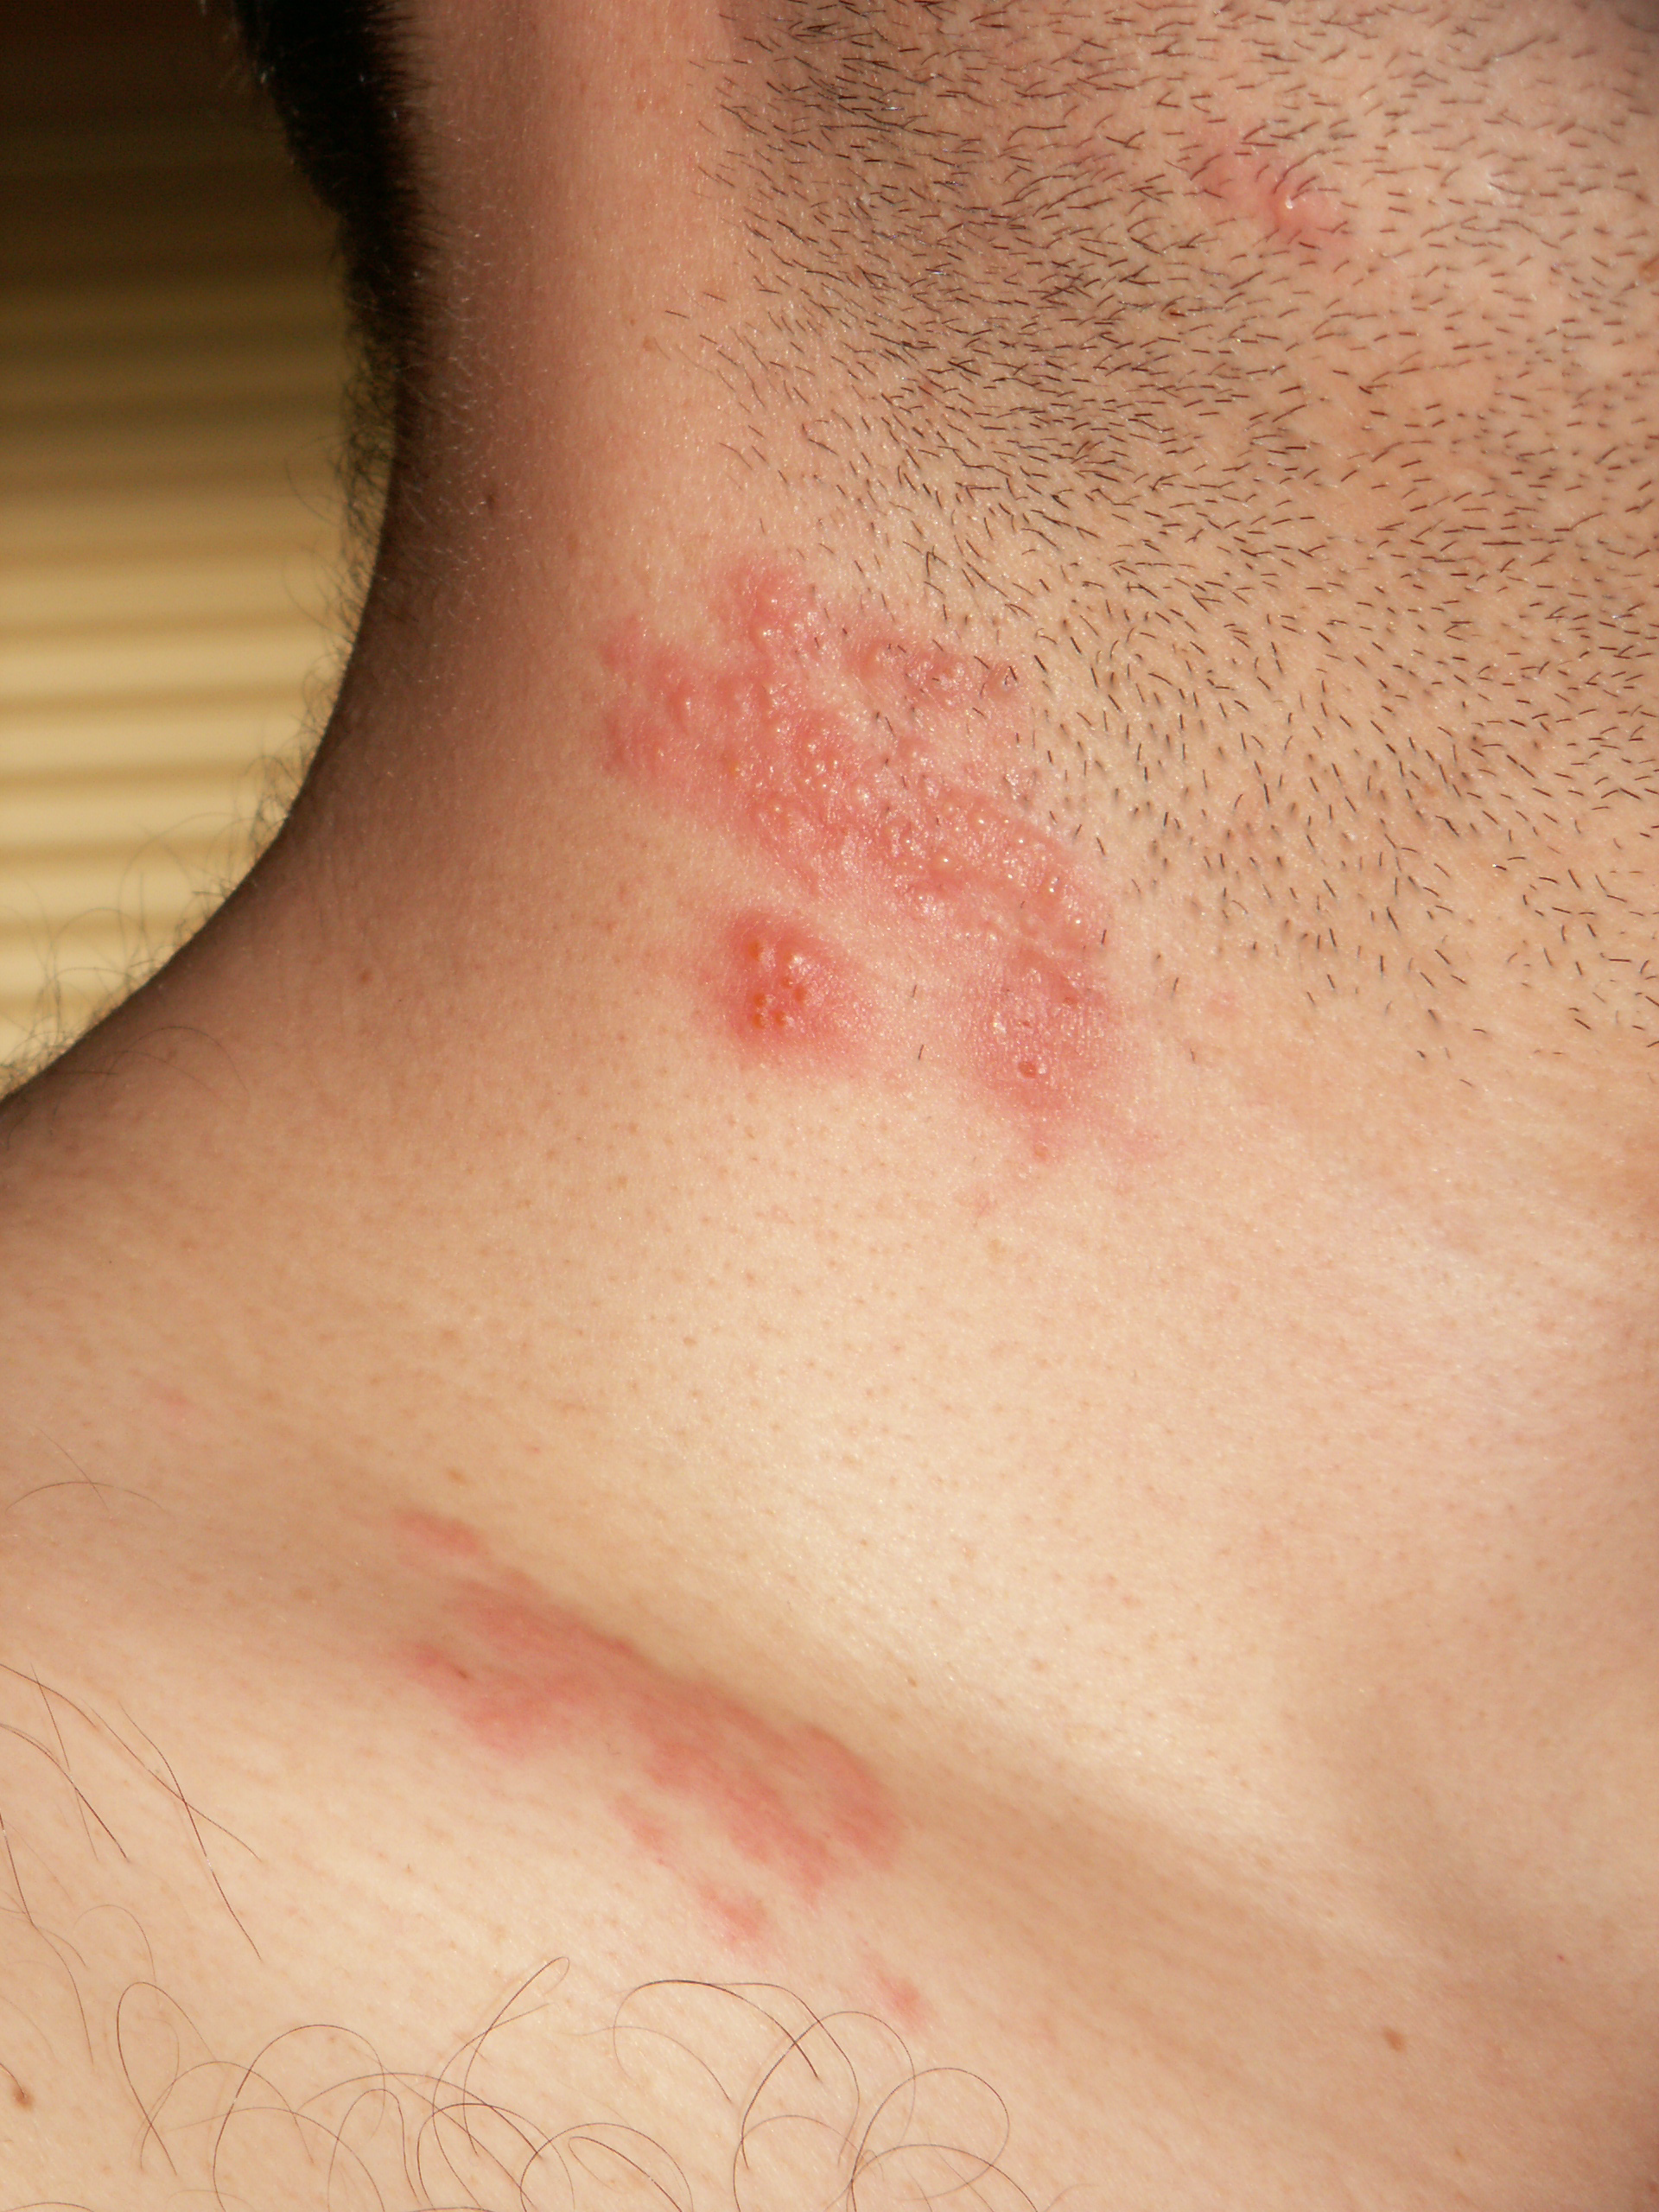 Hpv and skin rash. Human papillomavirus patient uk doctor